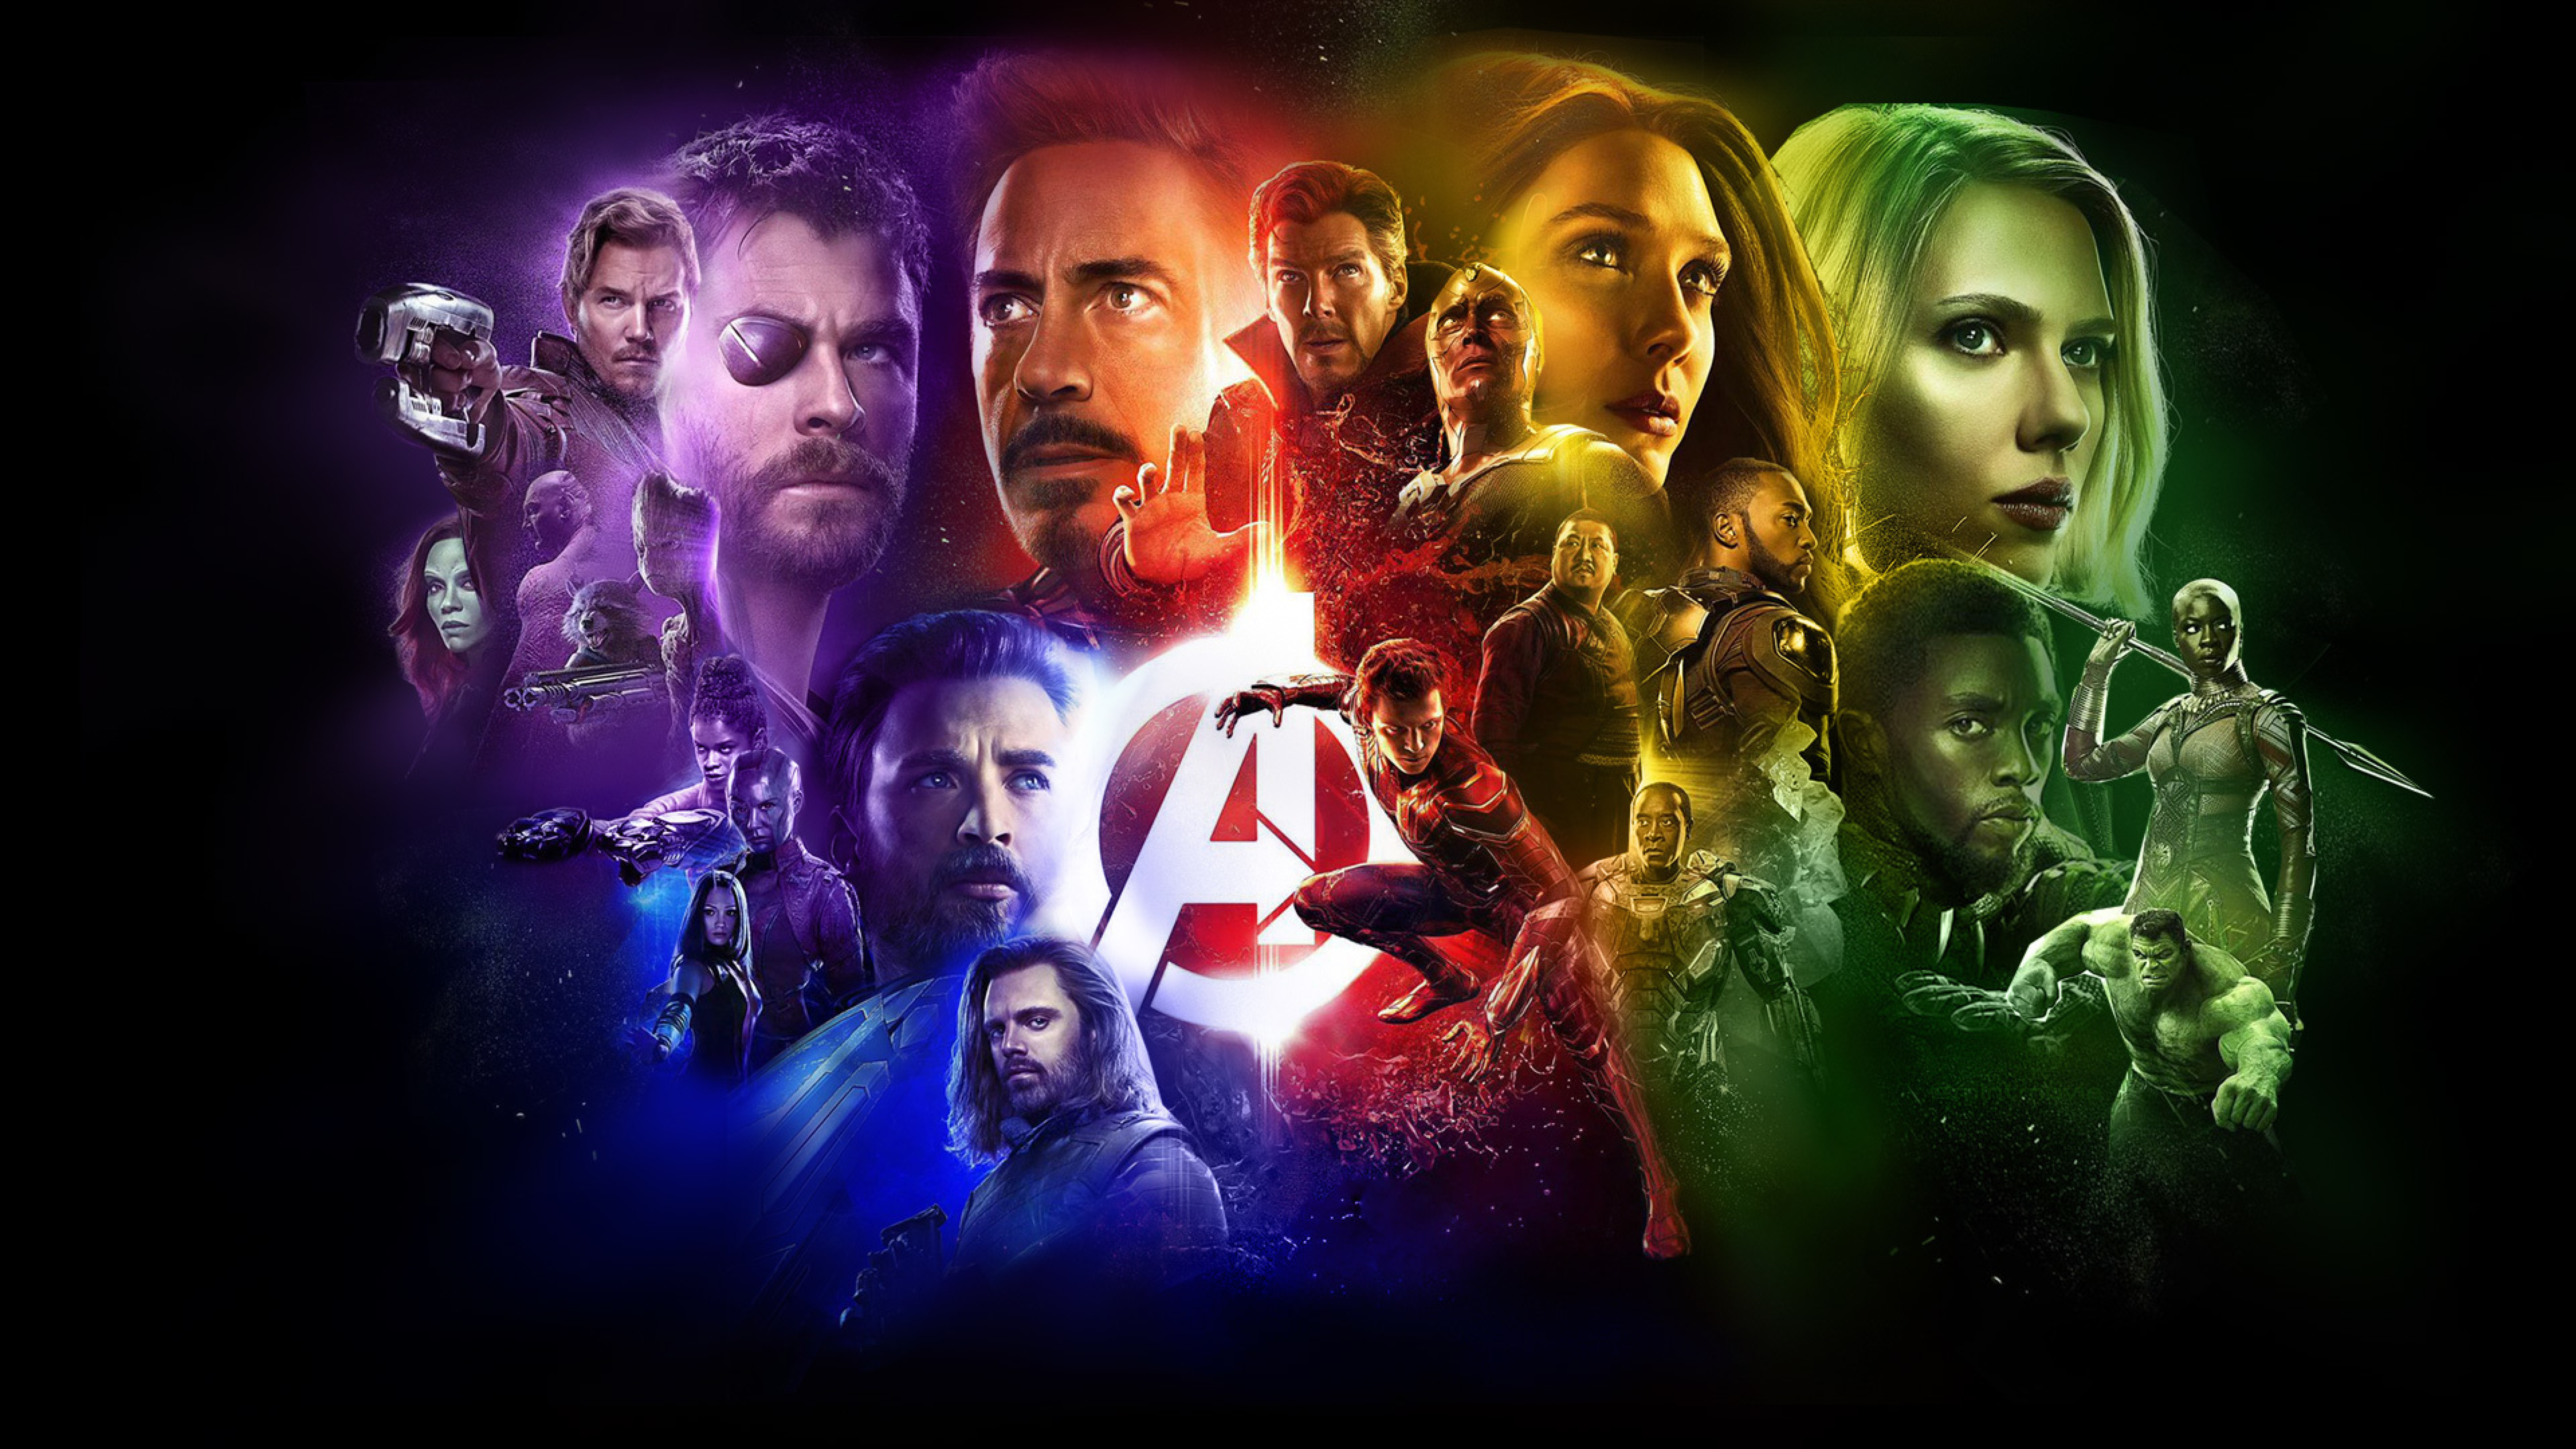 Unduh 2000 Wallpaper Avengers Infinity War 8k HD Terbaru